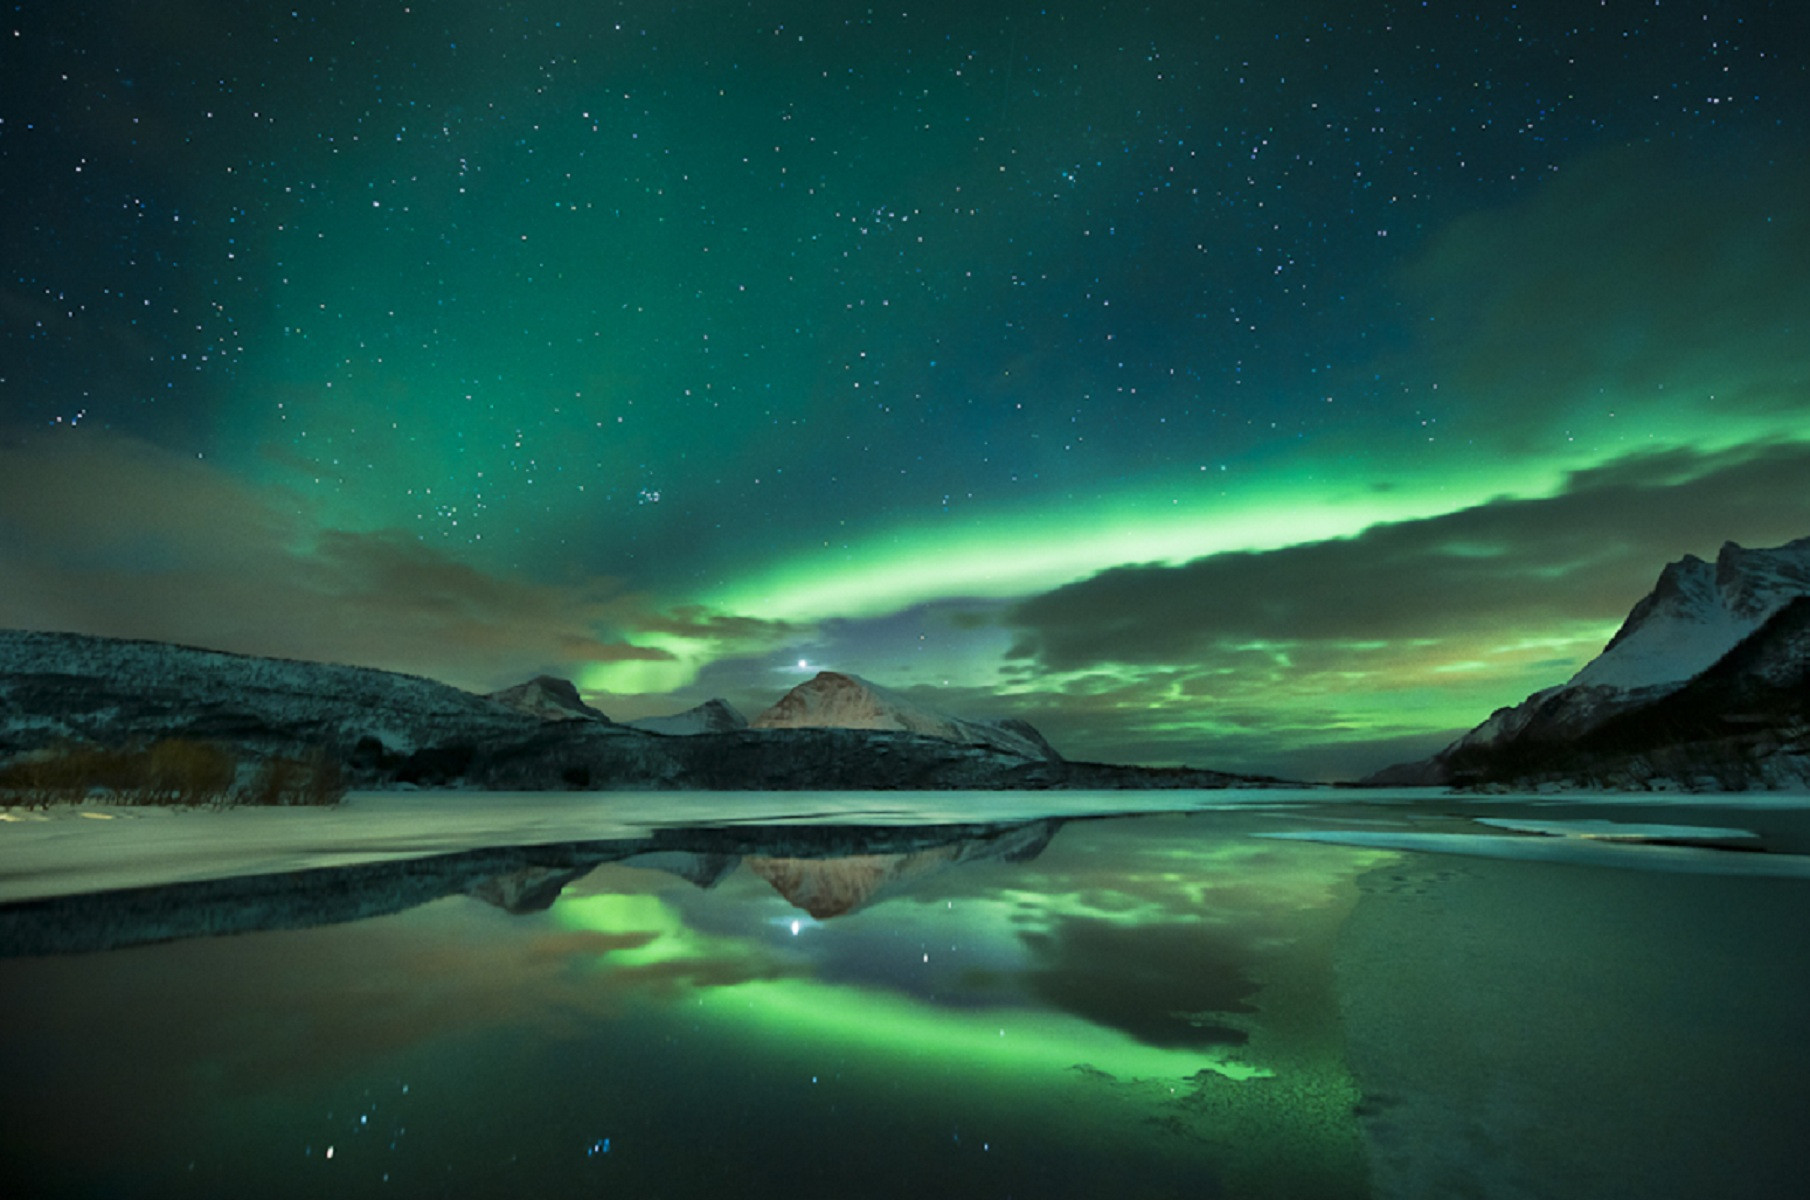 Northern Lights Wallpaper 1080p HD wallpaper background